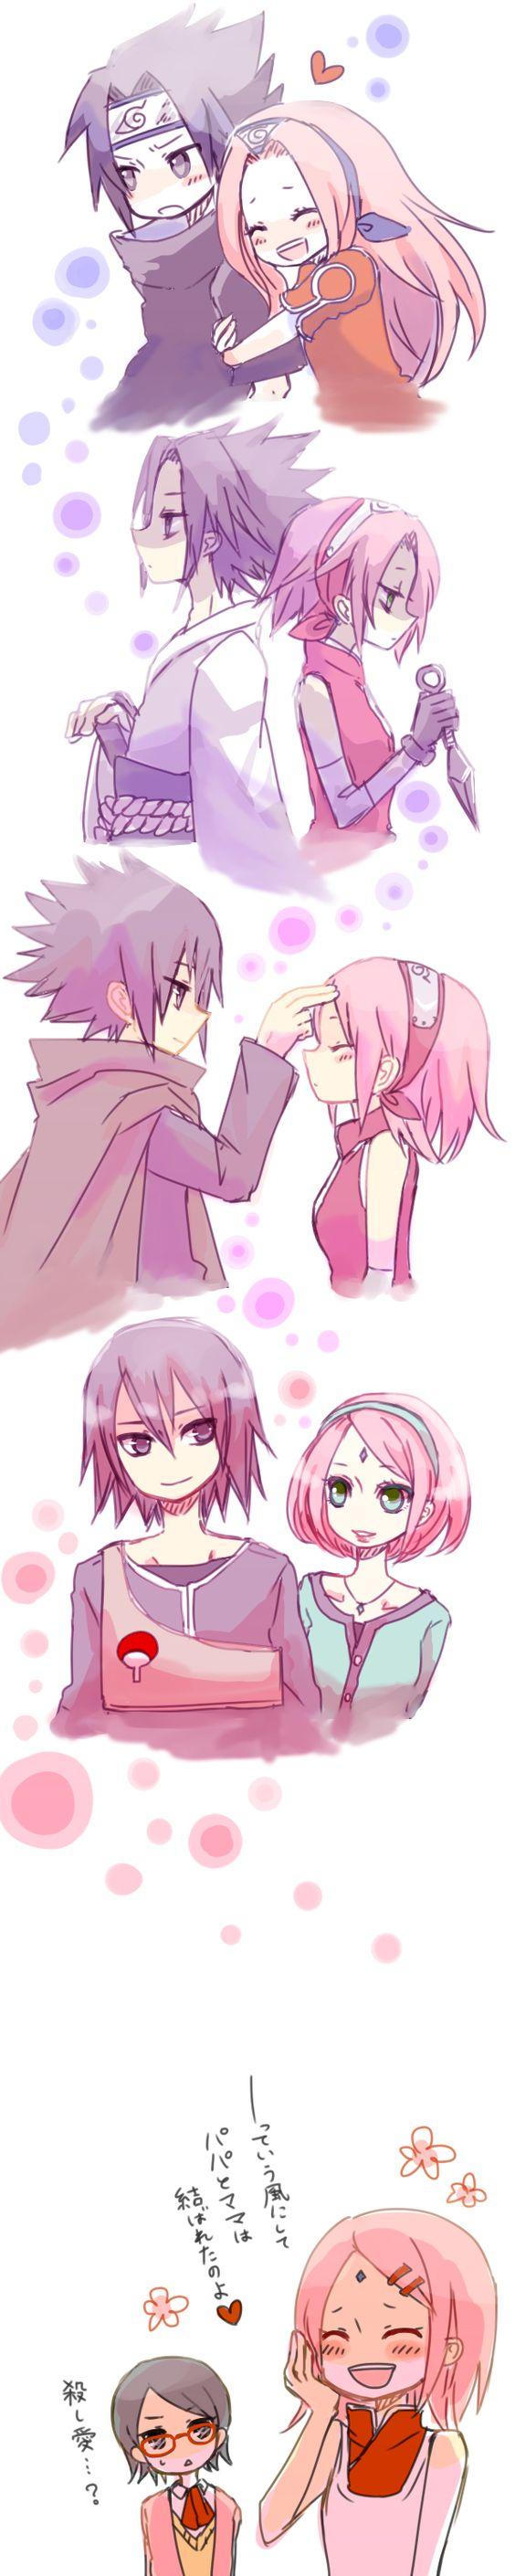 The years of SasuSaku. Sakura. Finally gets what's she's